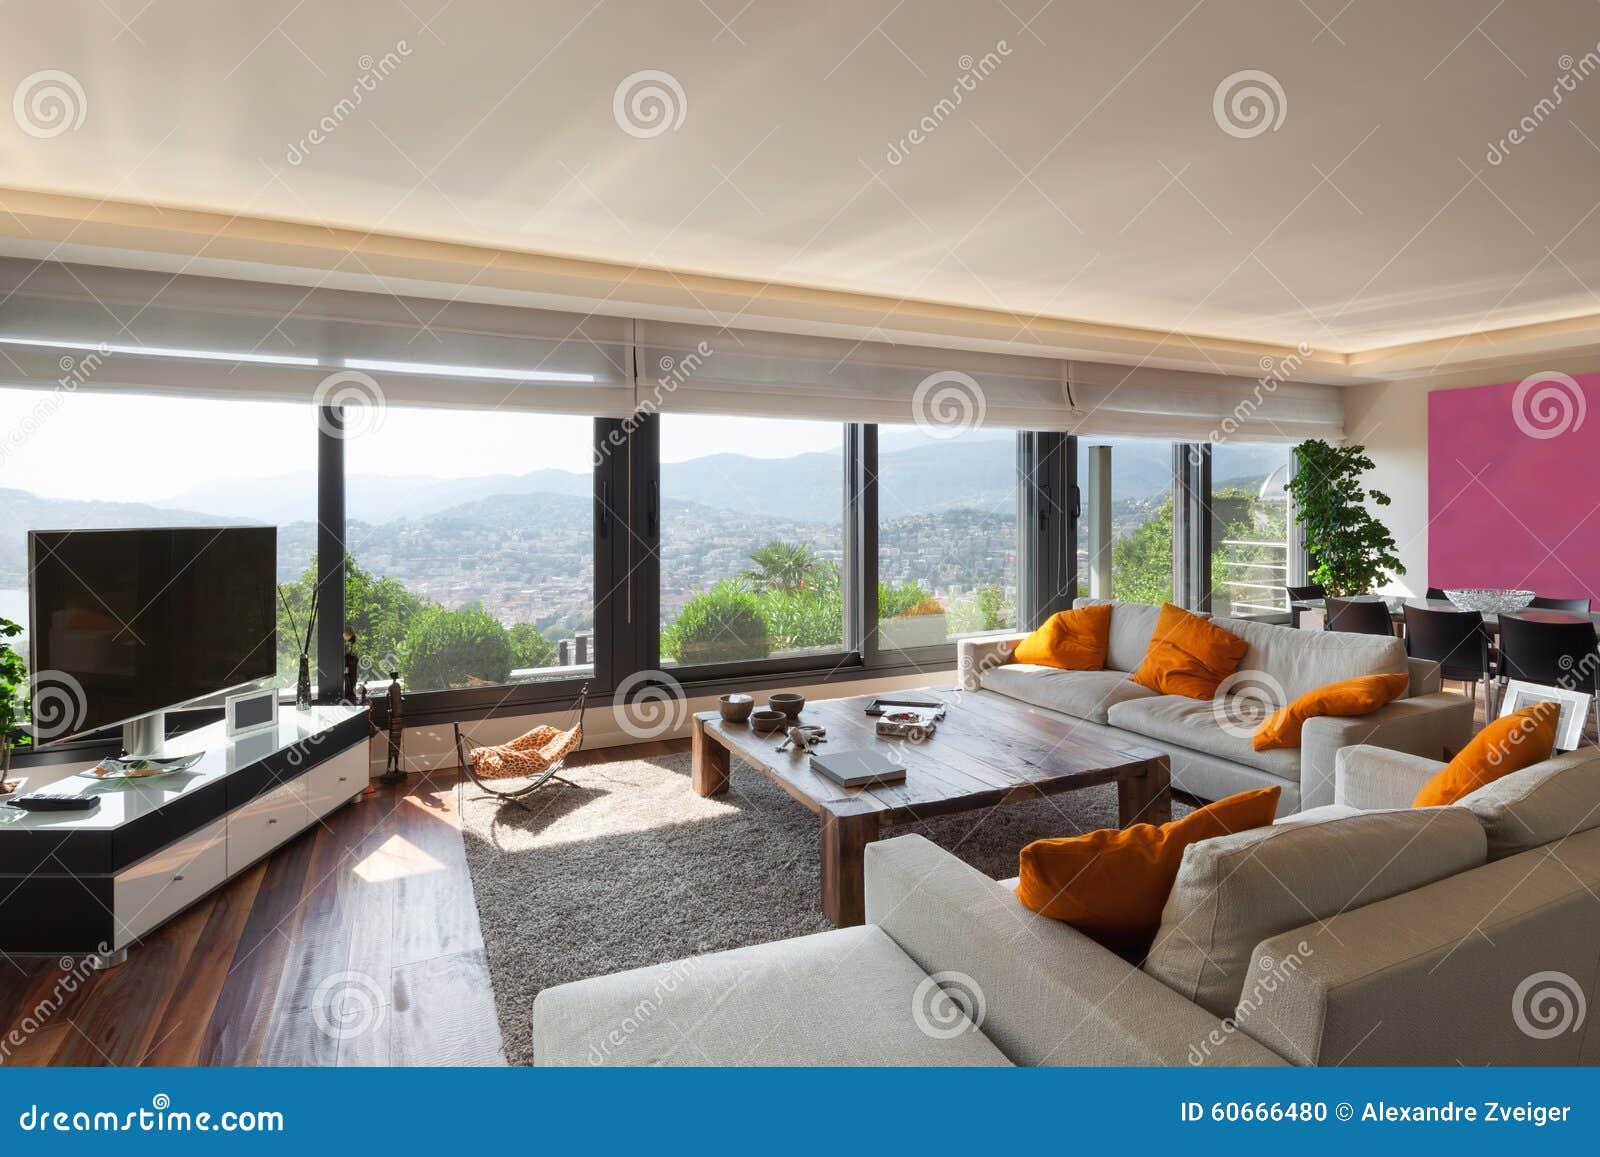 binnenlandse, mooie woonkamer stock foto - afbeelding: 60666480, Deco ideeën